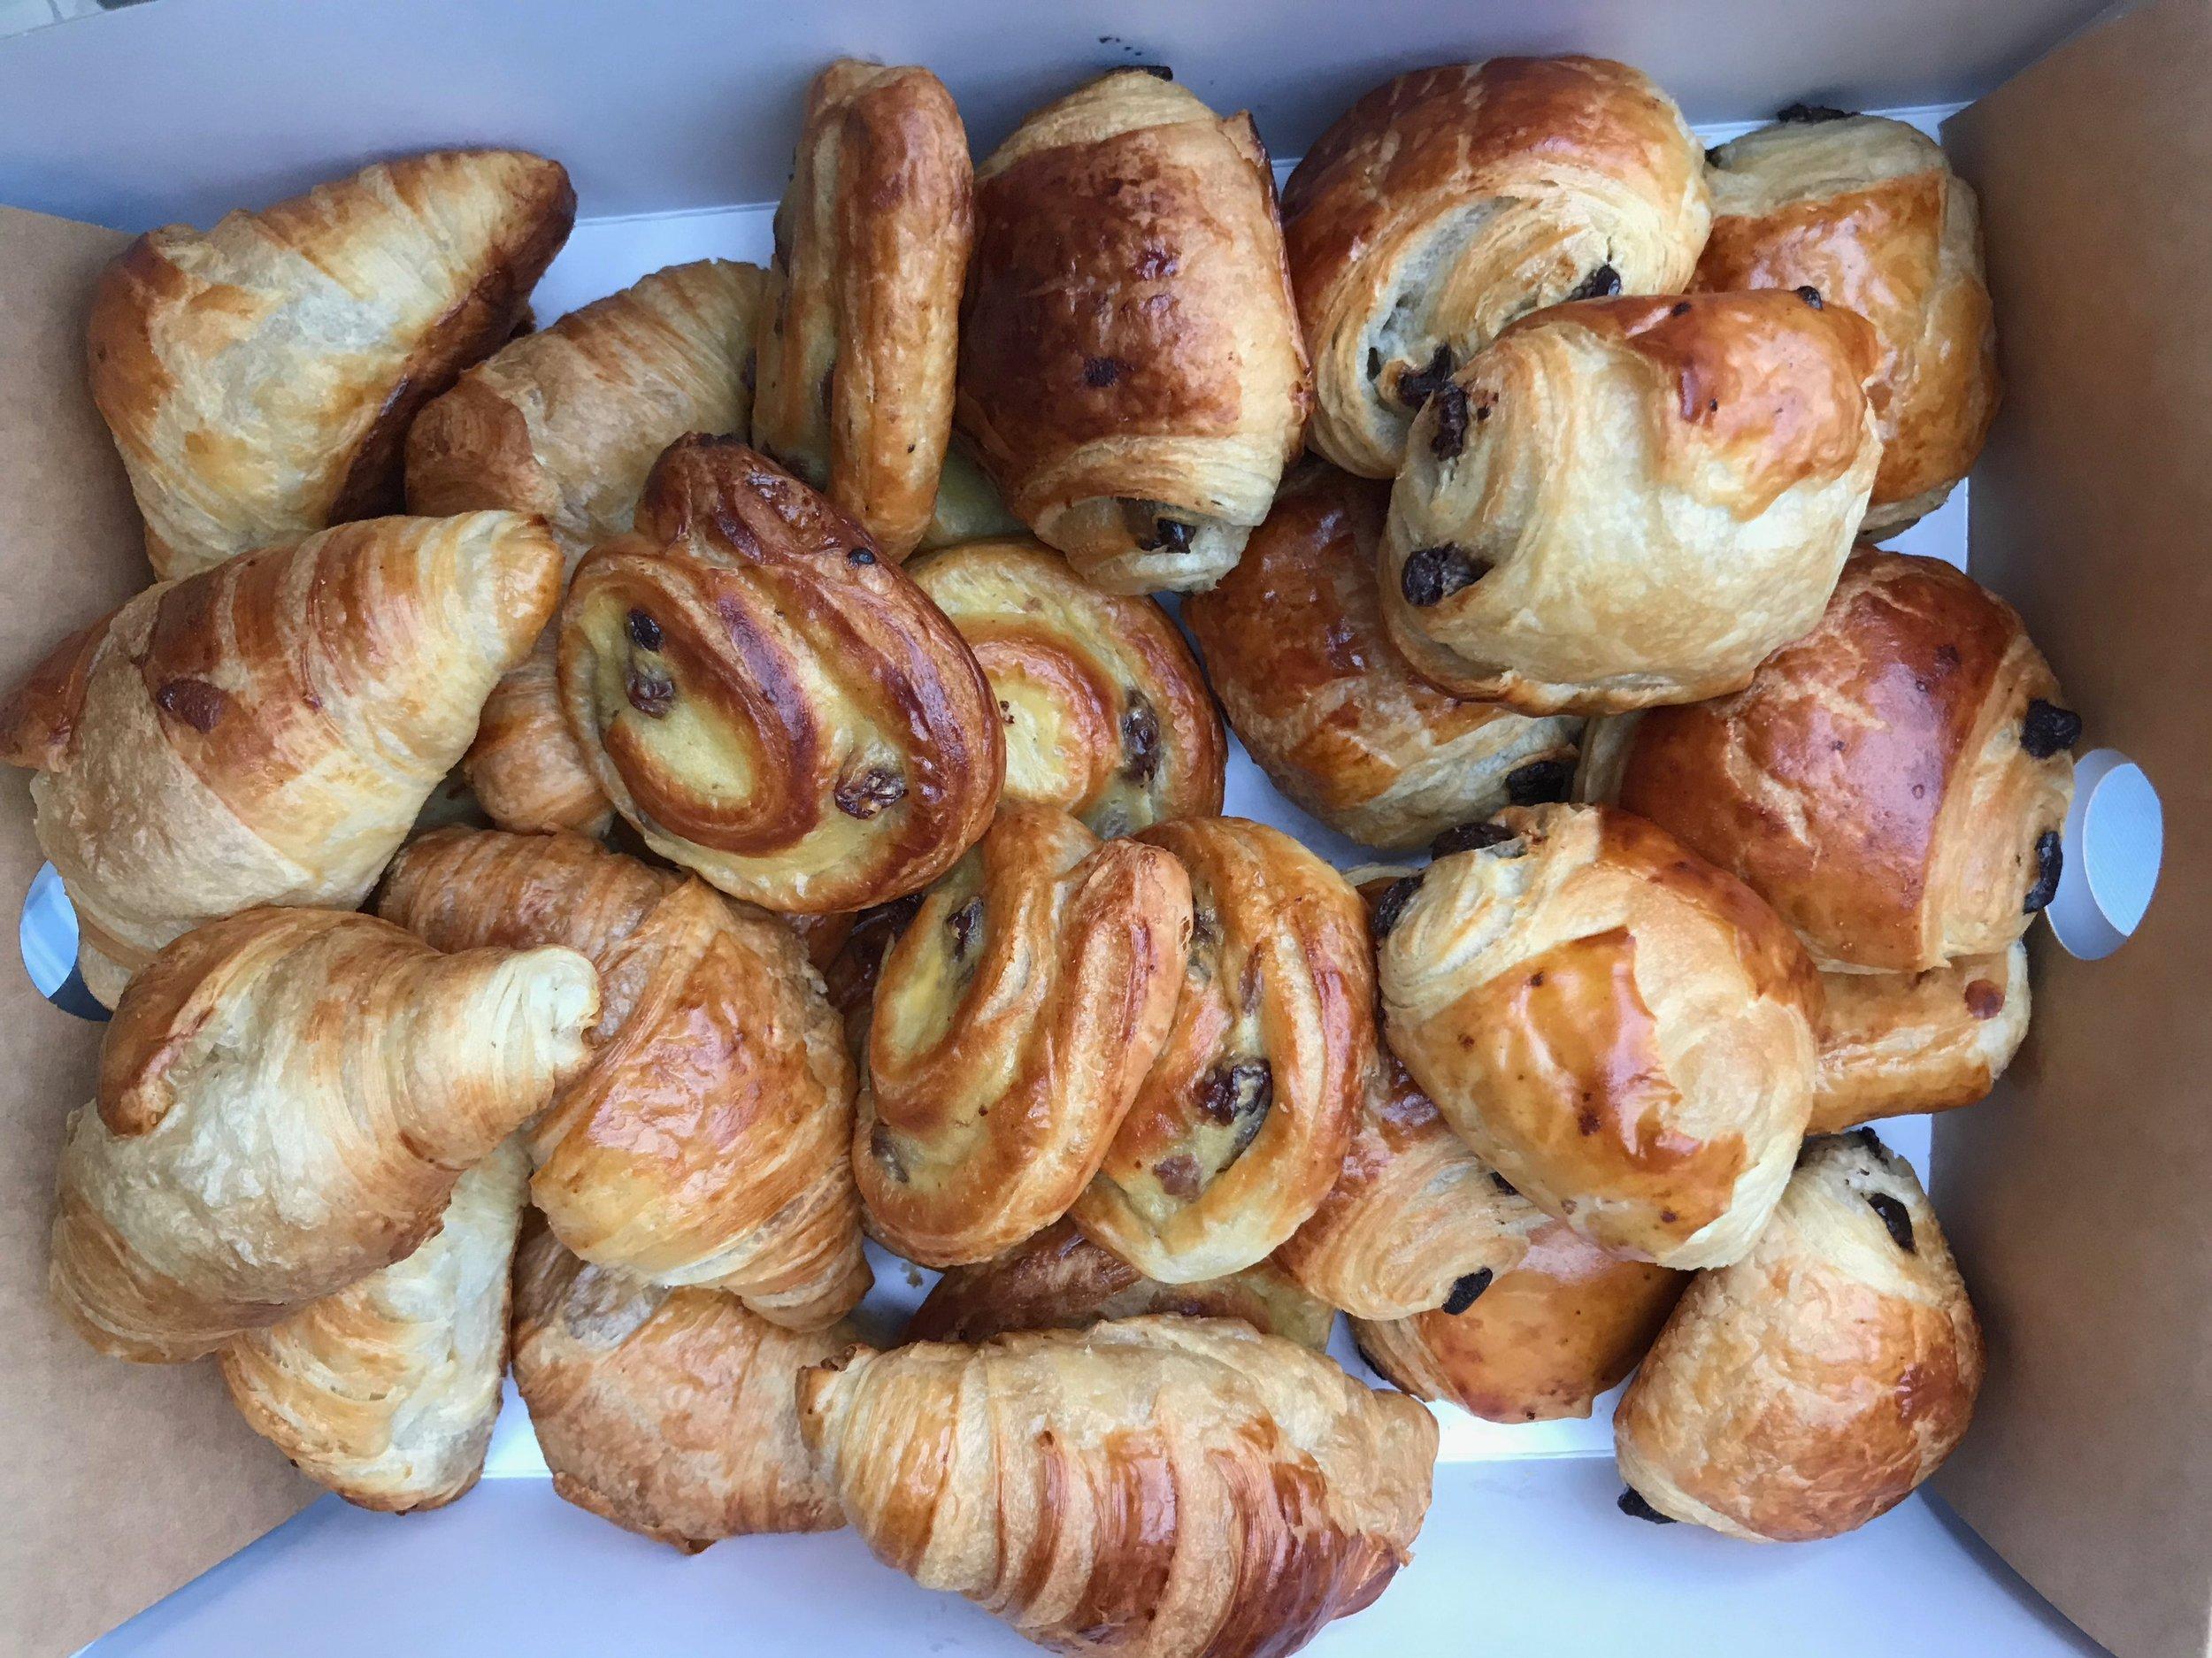 buttery mini breakfast pastries.box of 10 £10/ box of 20 £20 - all butter pain aux chocolats, pain aux raisins, croissants.